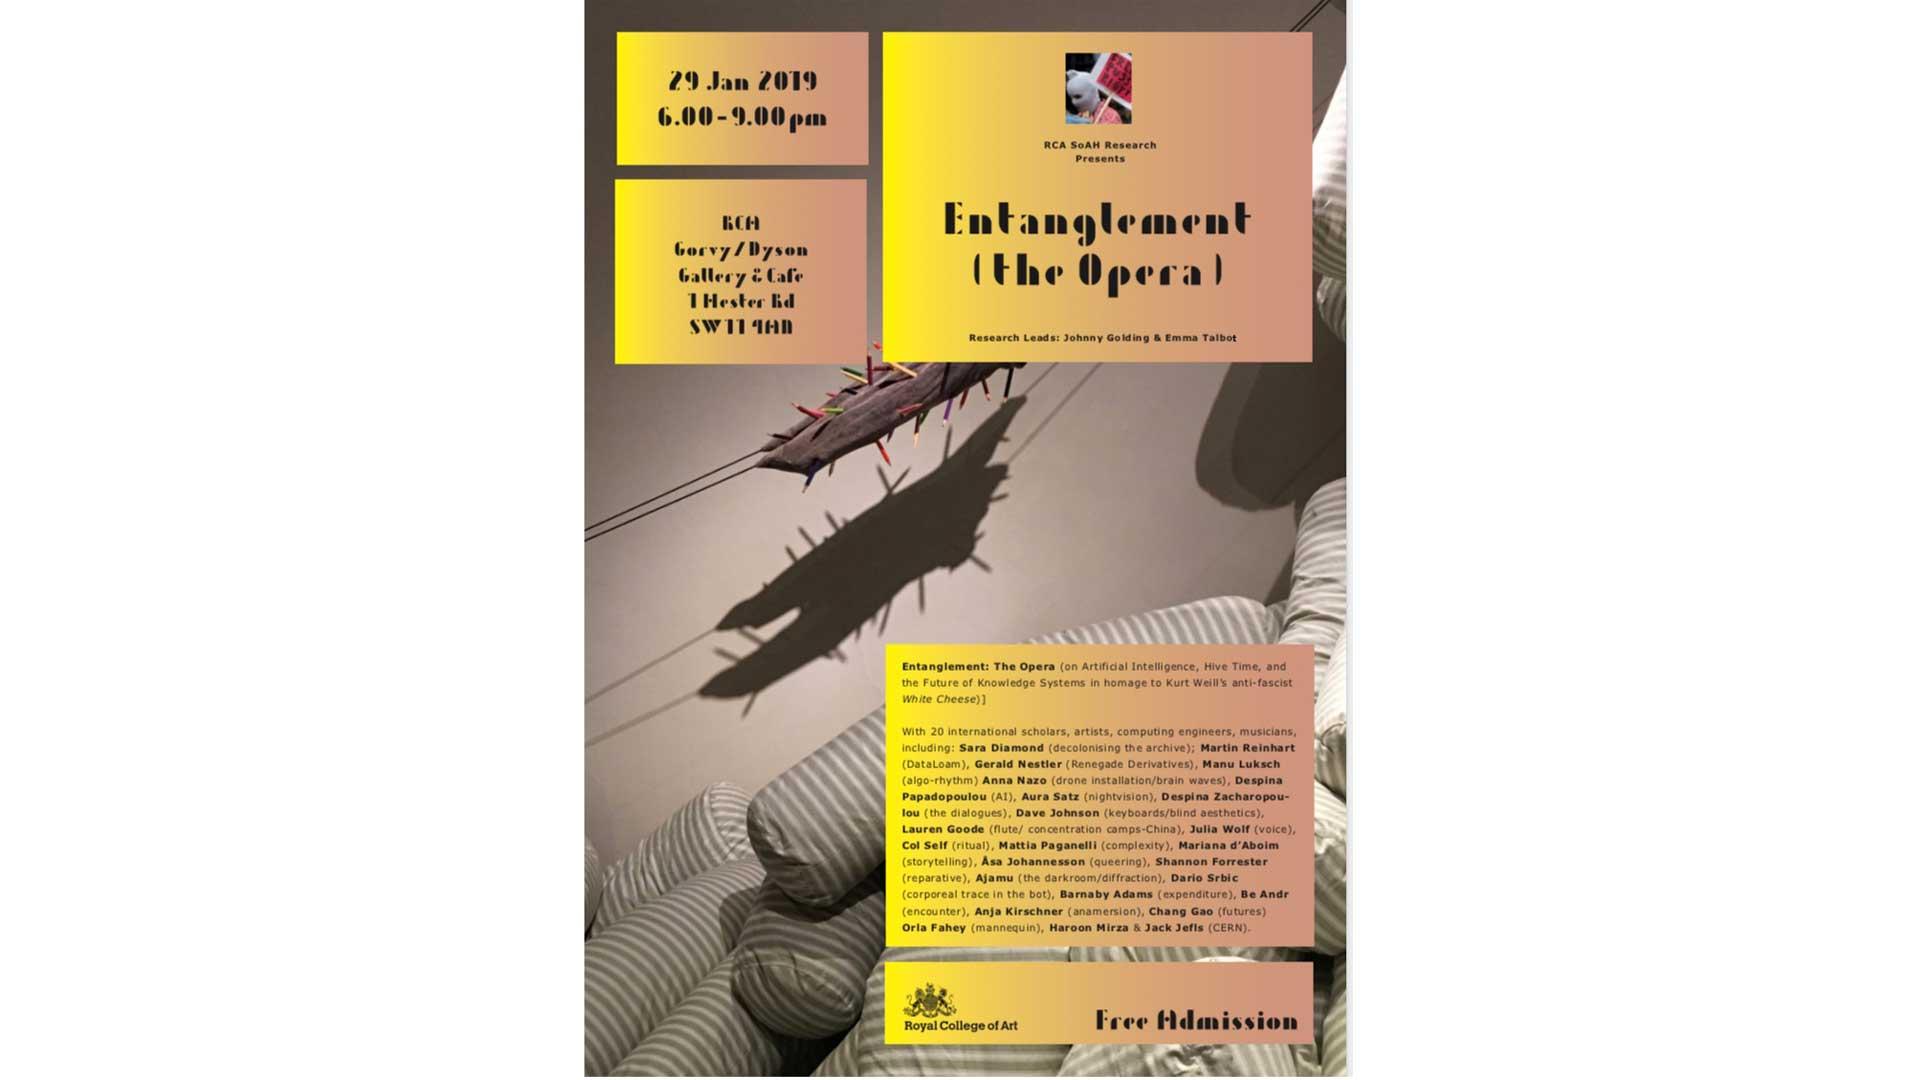 entanglement (the opera)